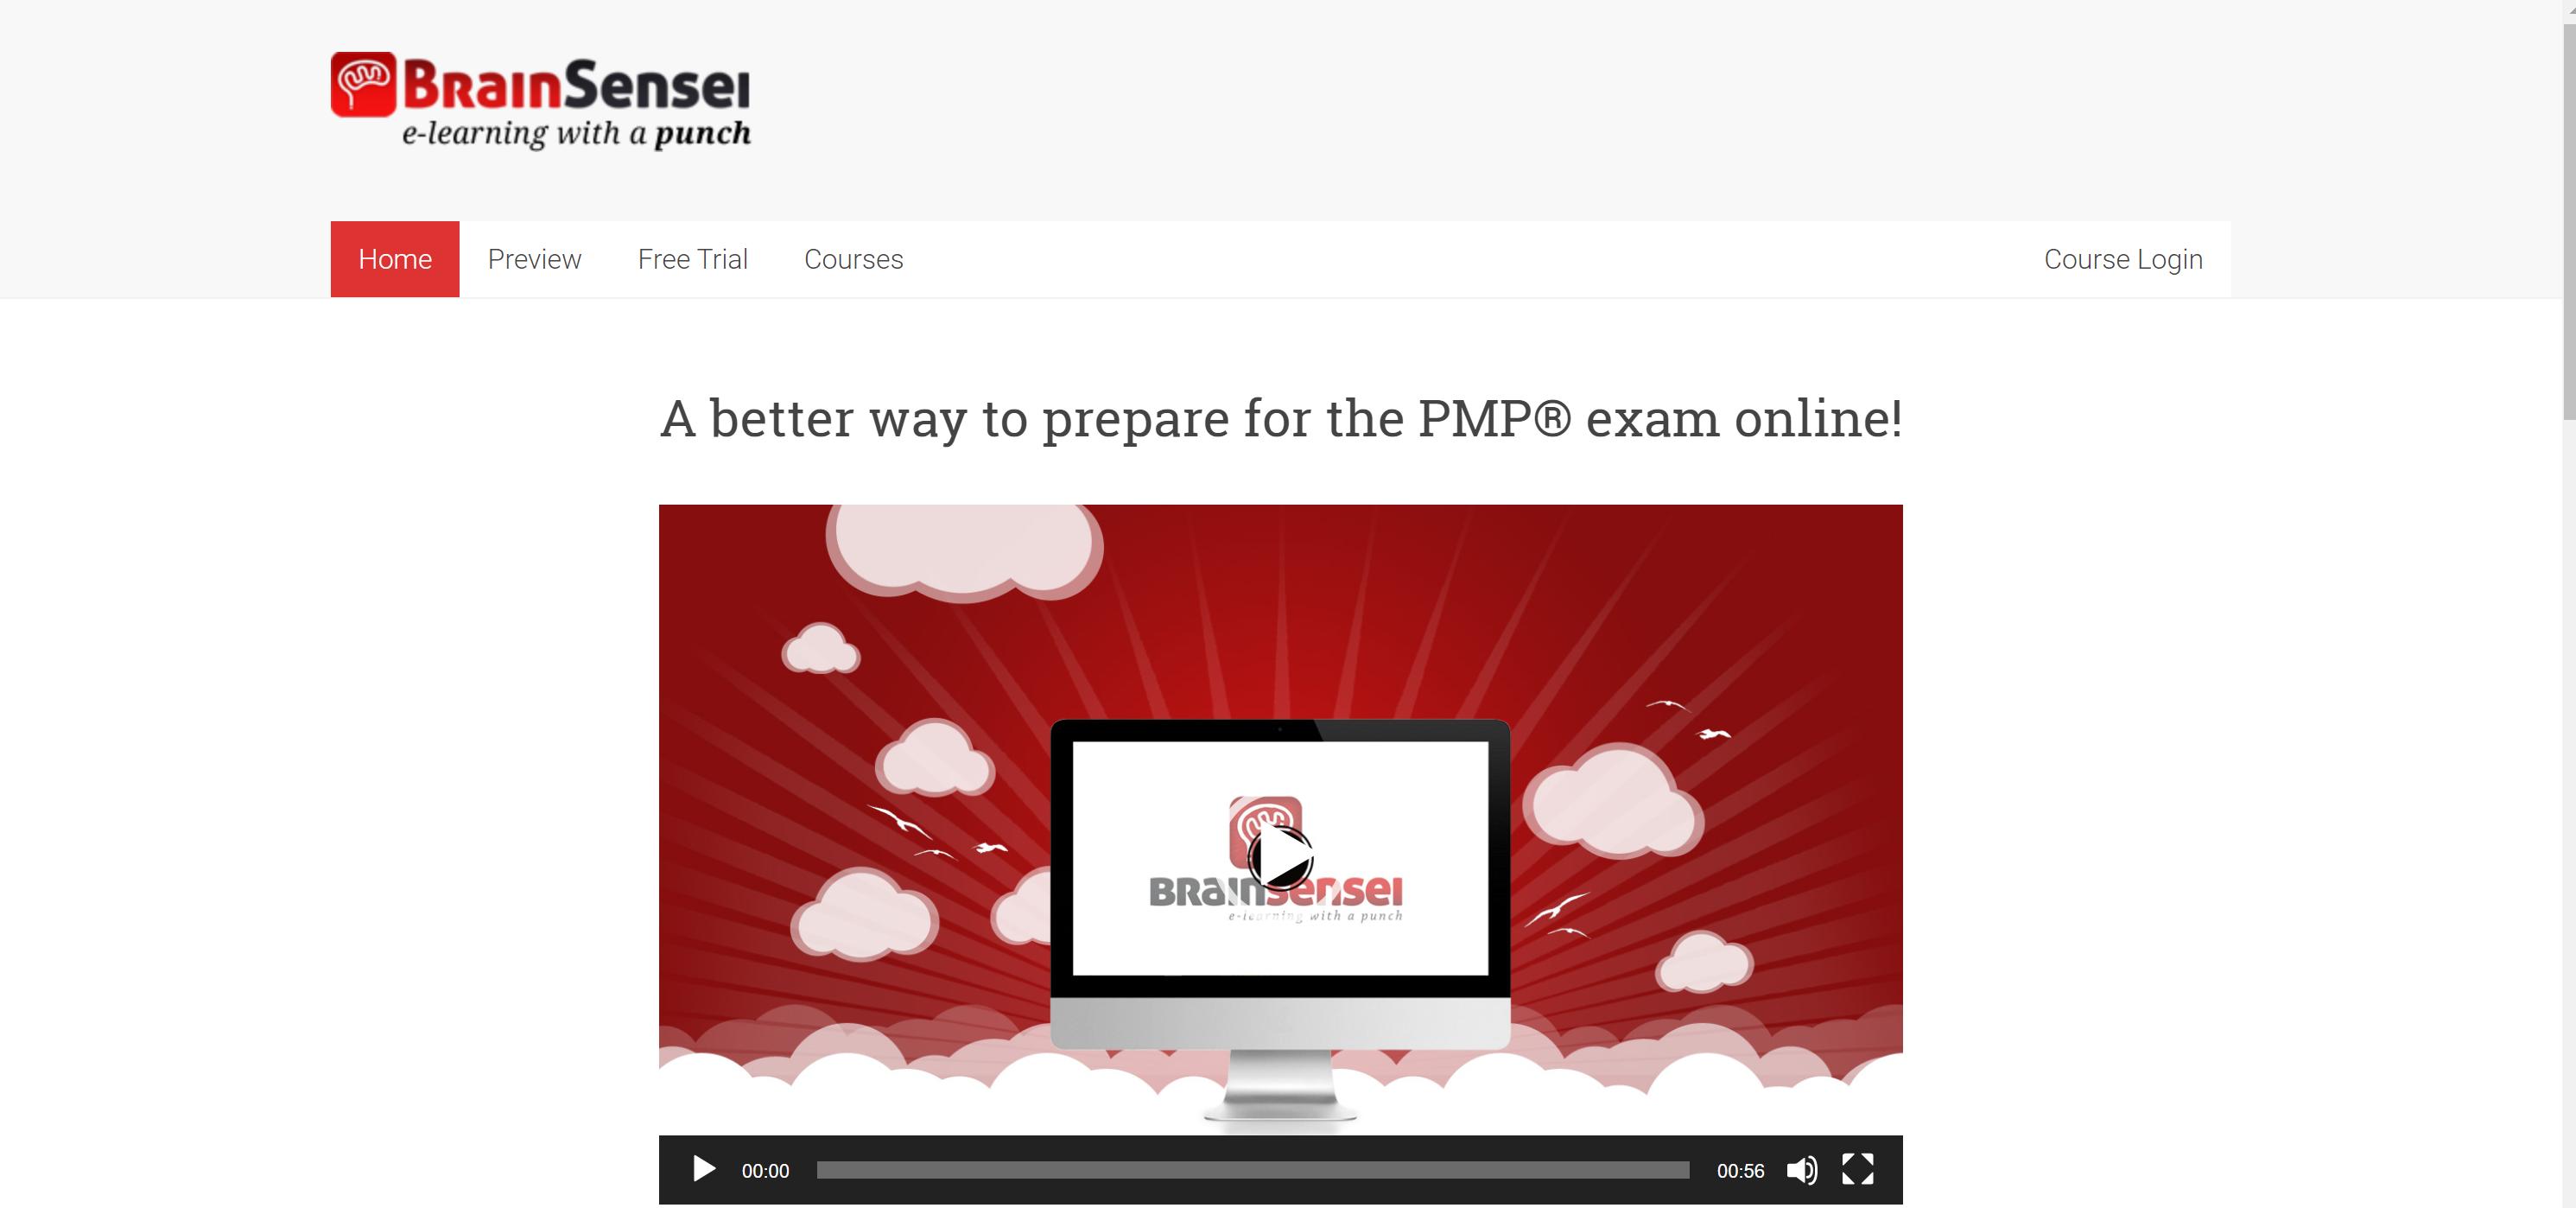 Brainsensei PMP courses